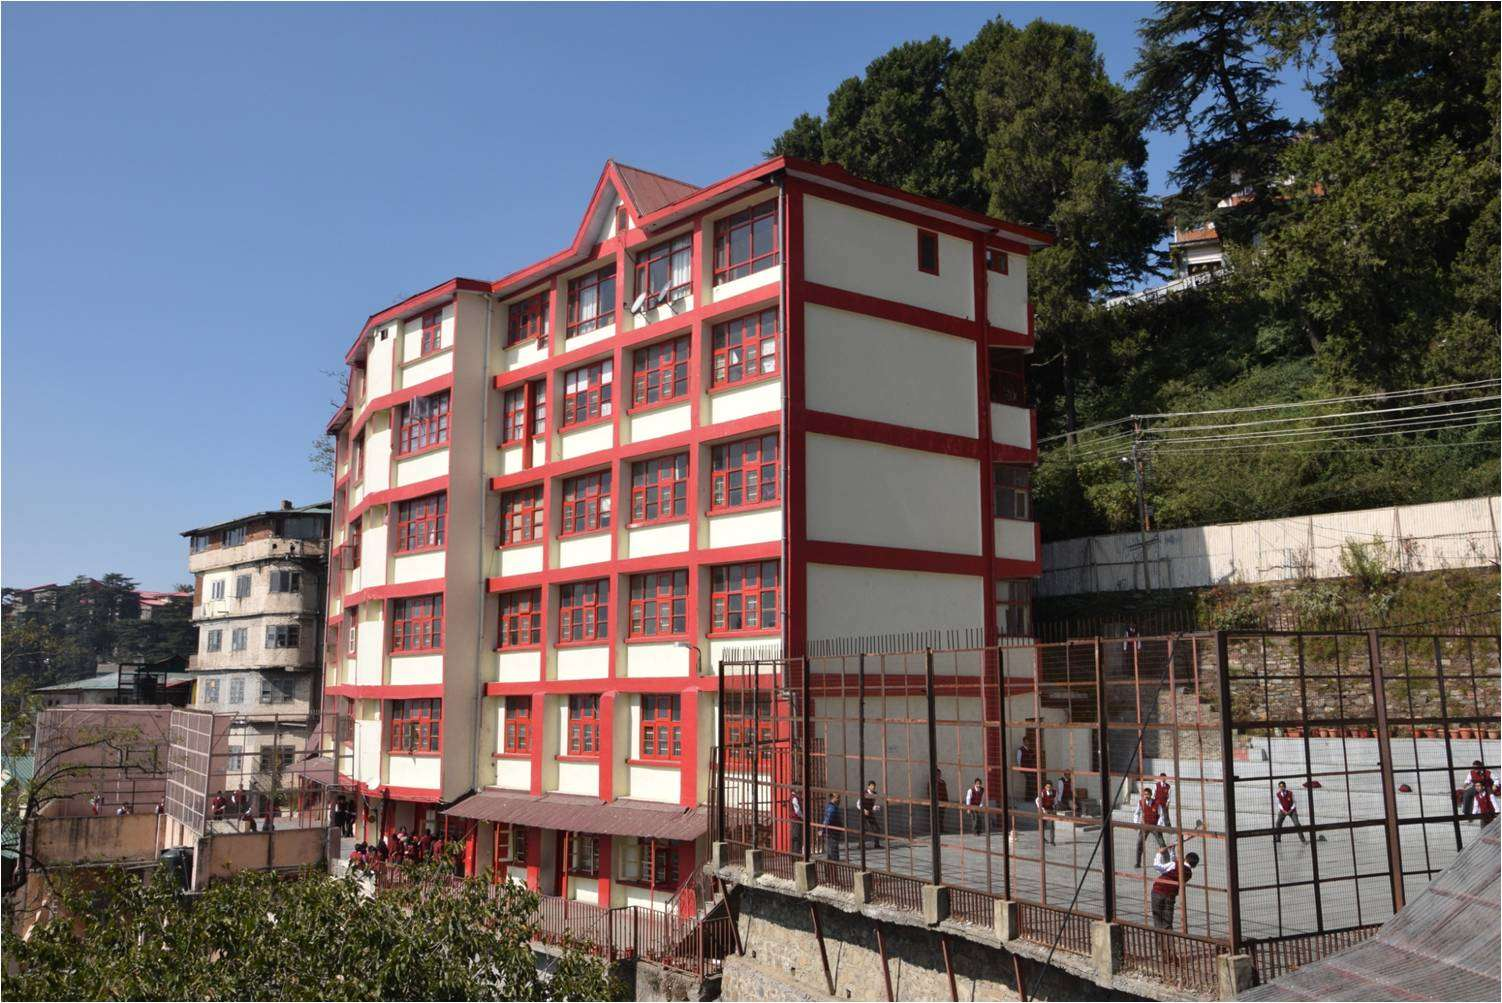 DAYANAND PUBLIC SCHOOL THE MALL SHIMLA HIMACHAL PRADESH 630030